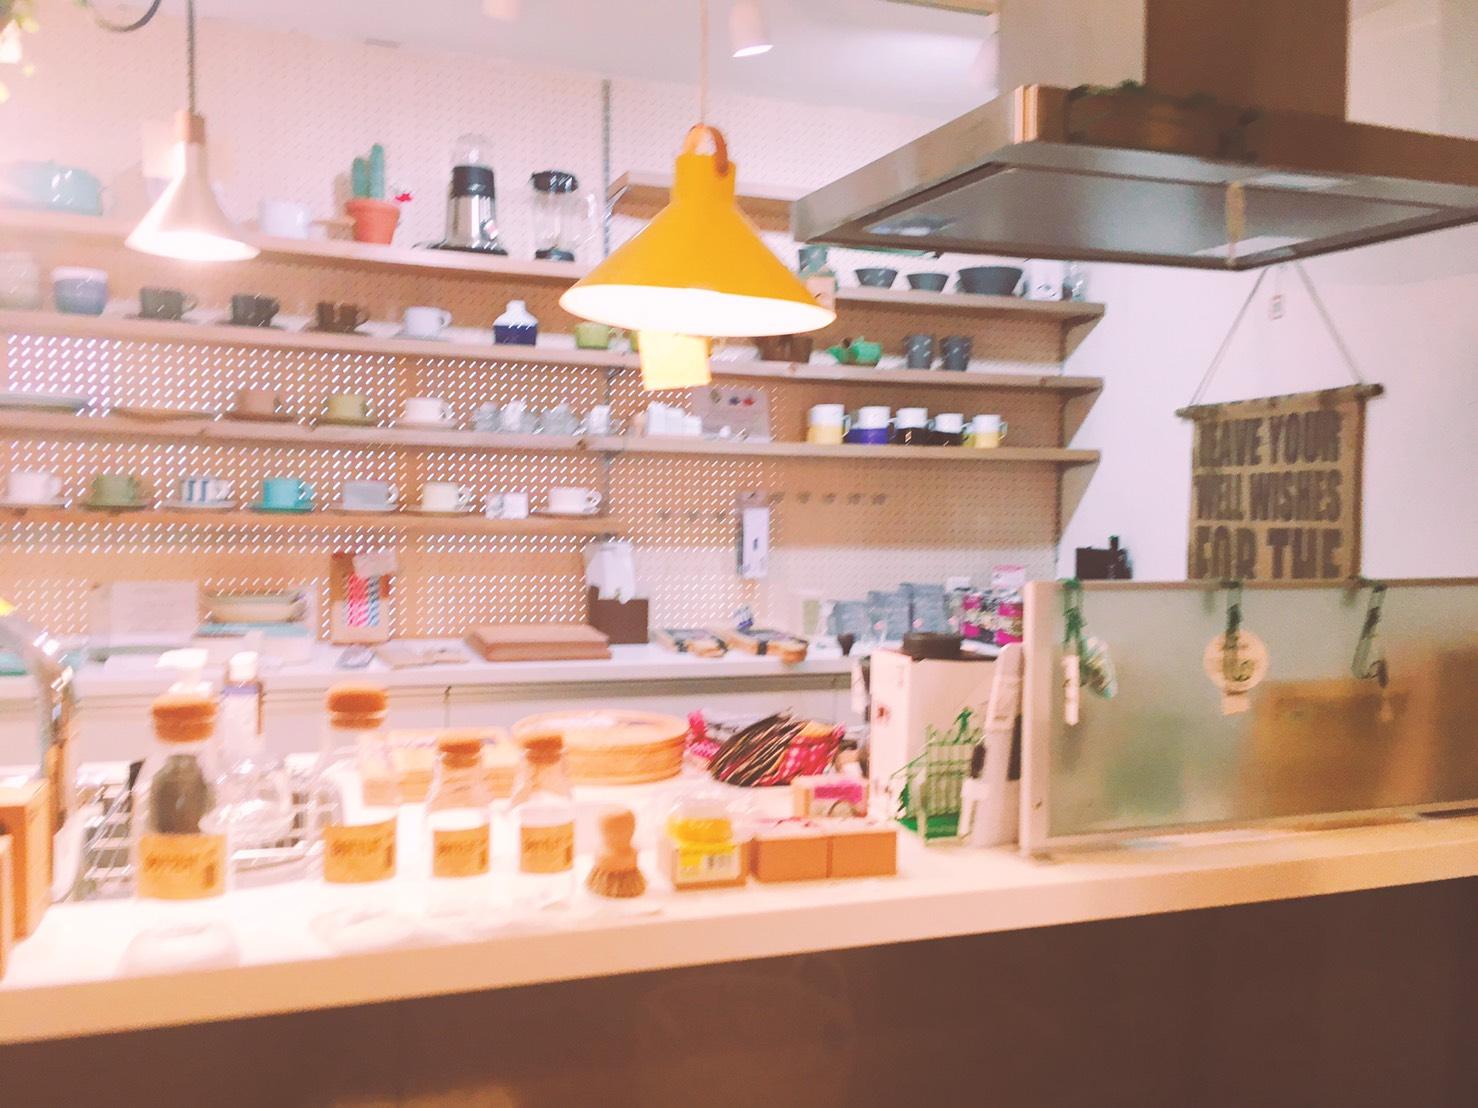 (Google 번역) 은둔지적인 세련된 식당. 맛도 볼륨도 충분 해요  (원본) 隠れ家的なおしゃれな食堂。味もボリュームも十分ですよ